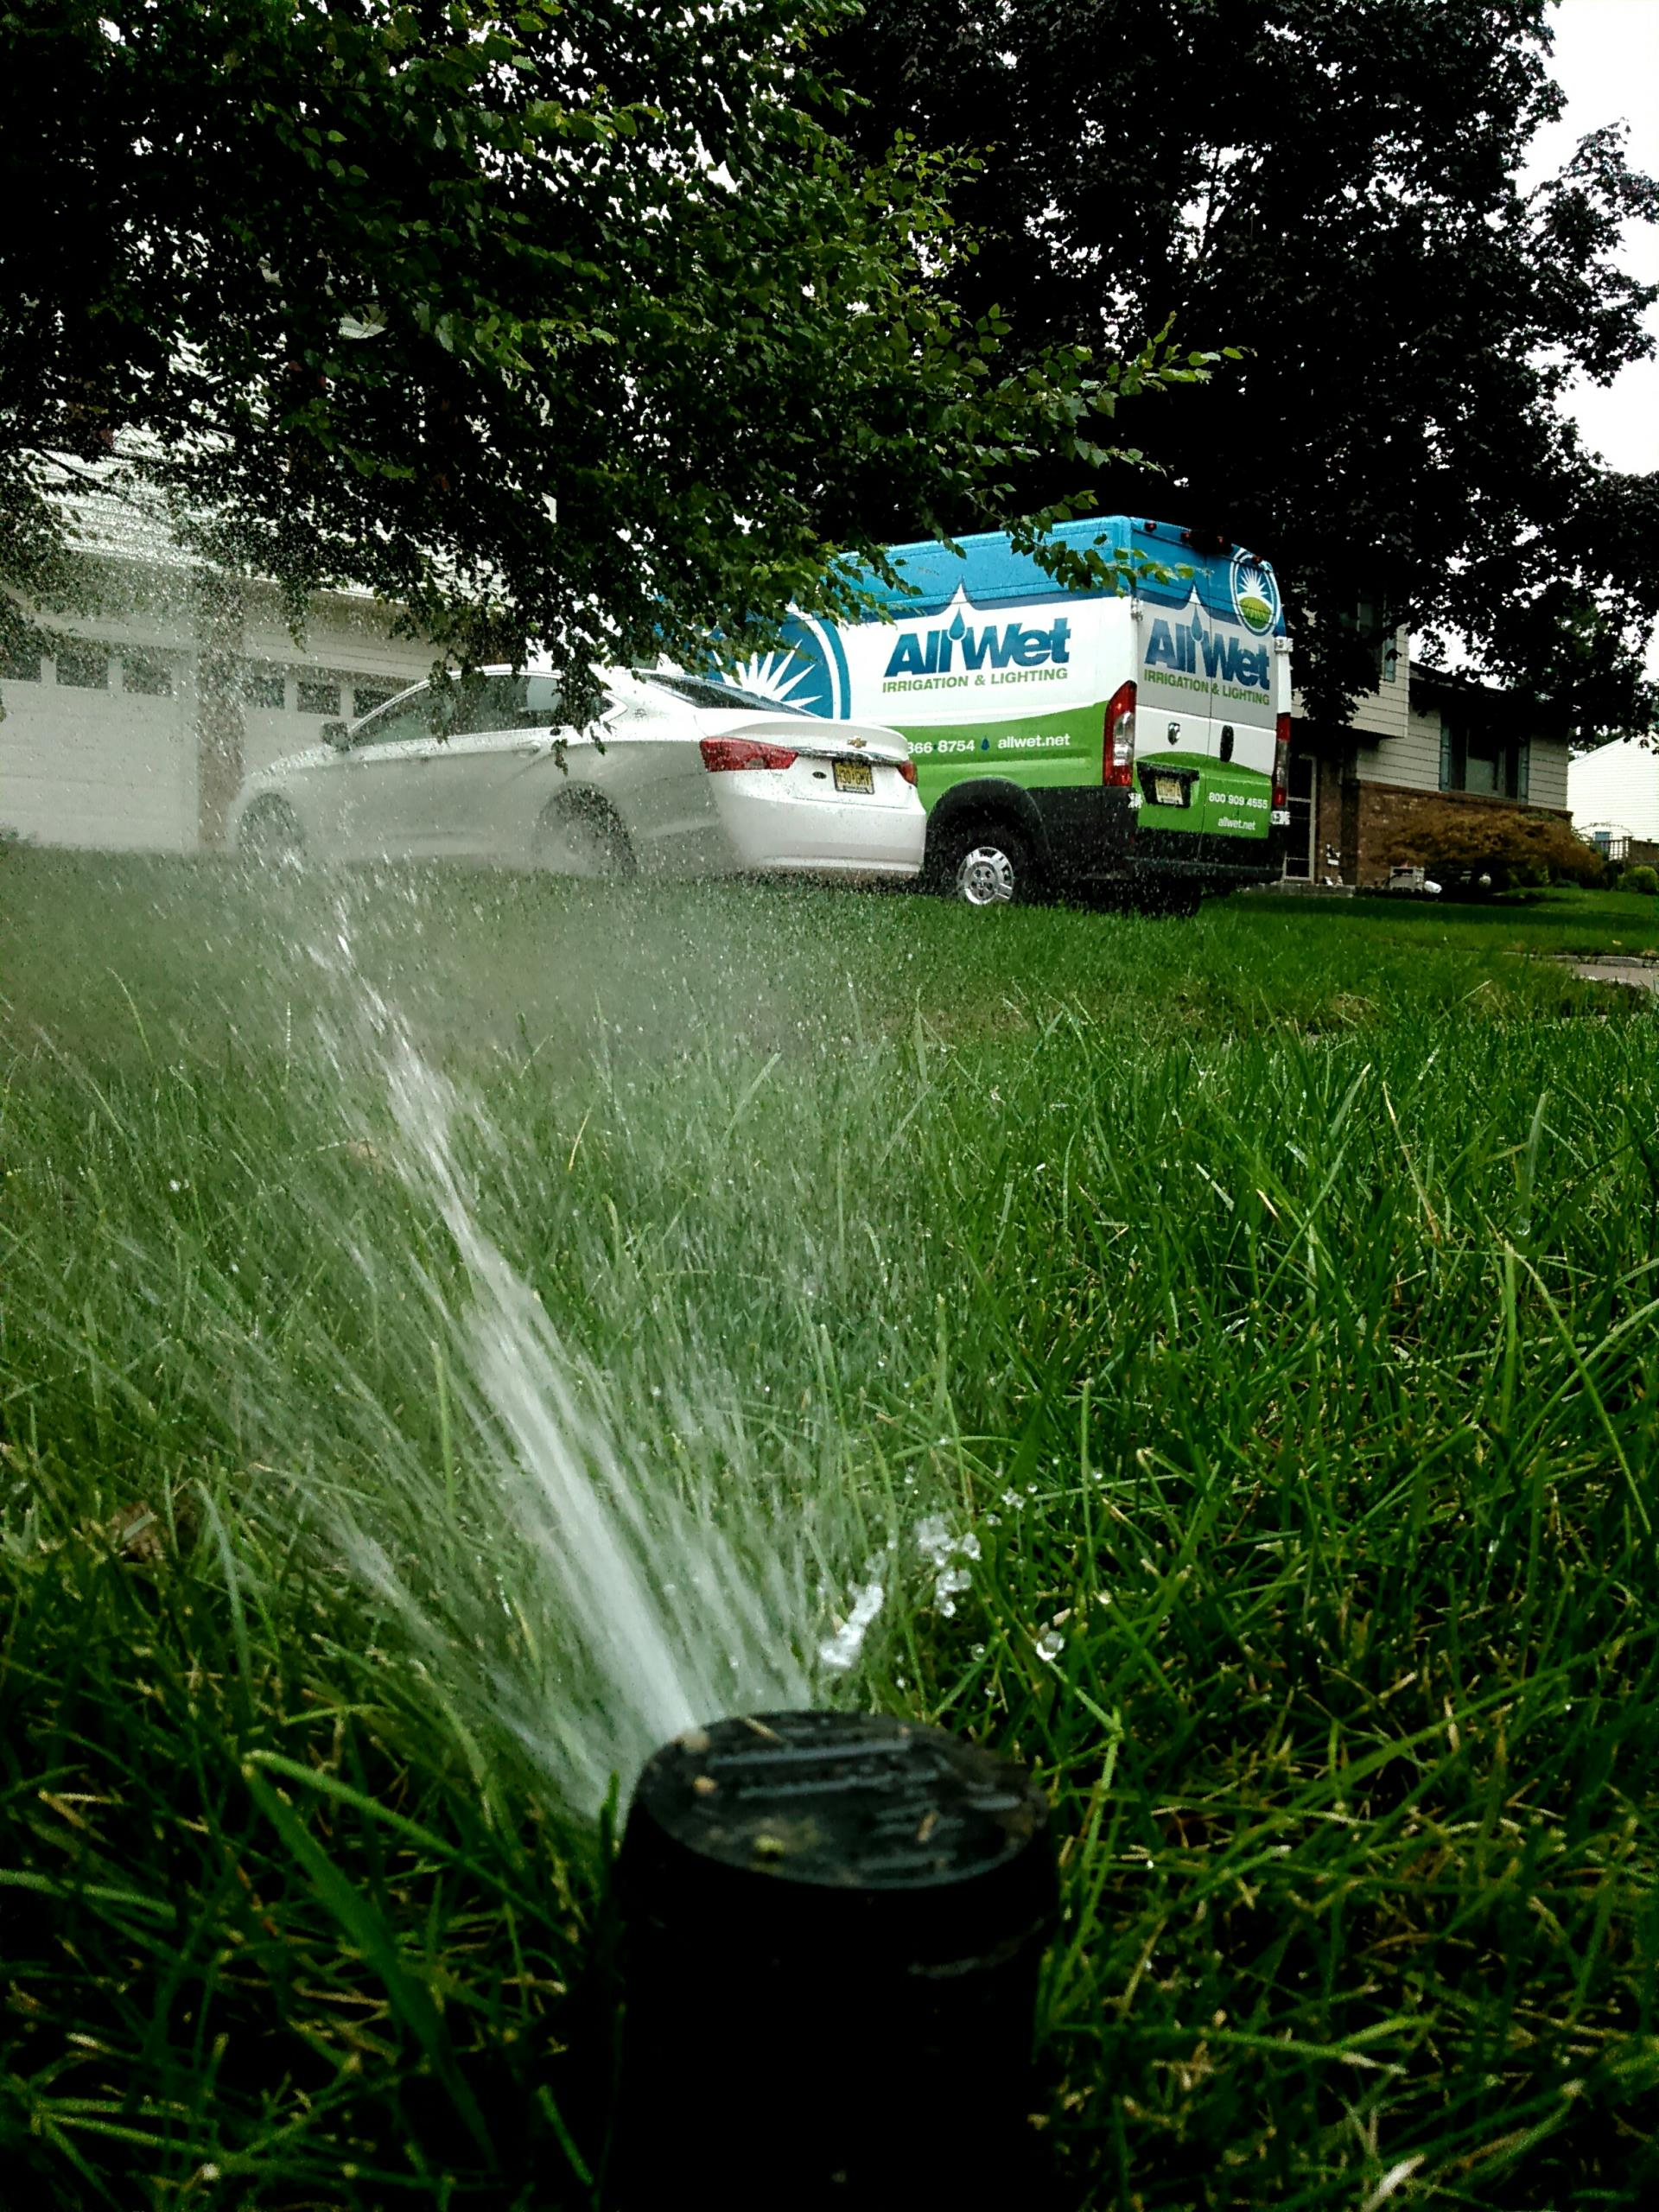 Mountainside, NJ - Mid season sprinkler service, adjust time on zones for better watering during the summer